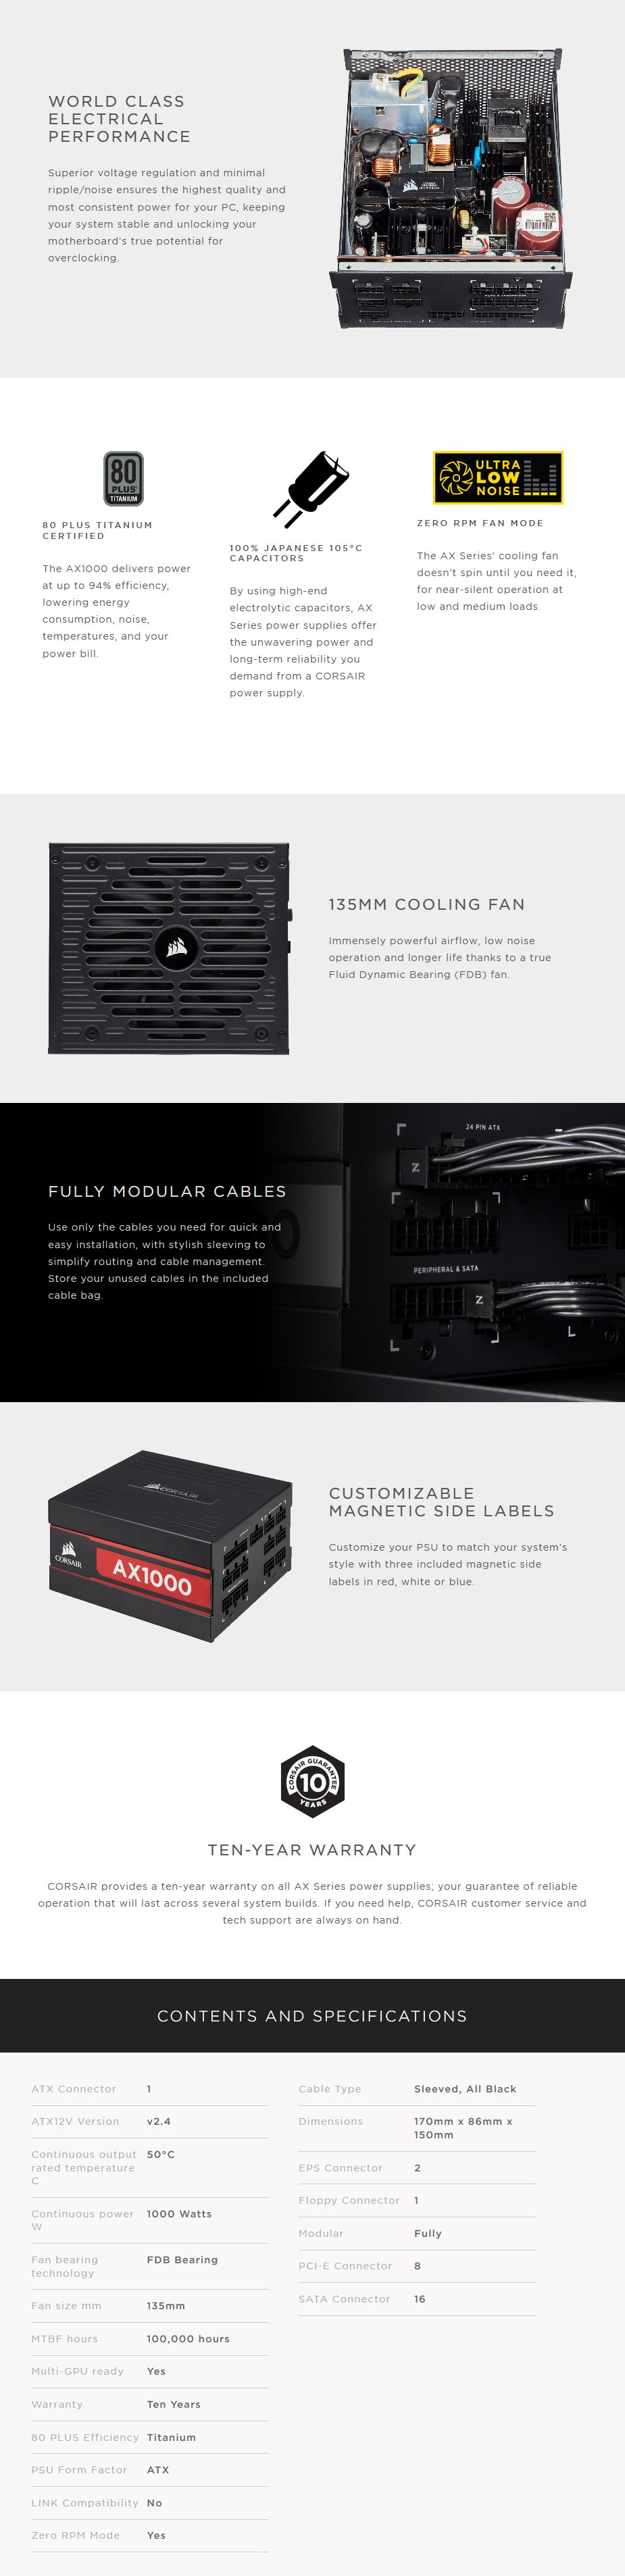 Corsair AX1000 80 PLUS Titanium Fully Modular ATX Power Supply - Desktop Overview 1